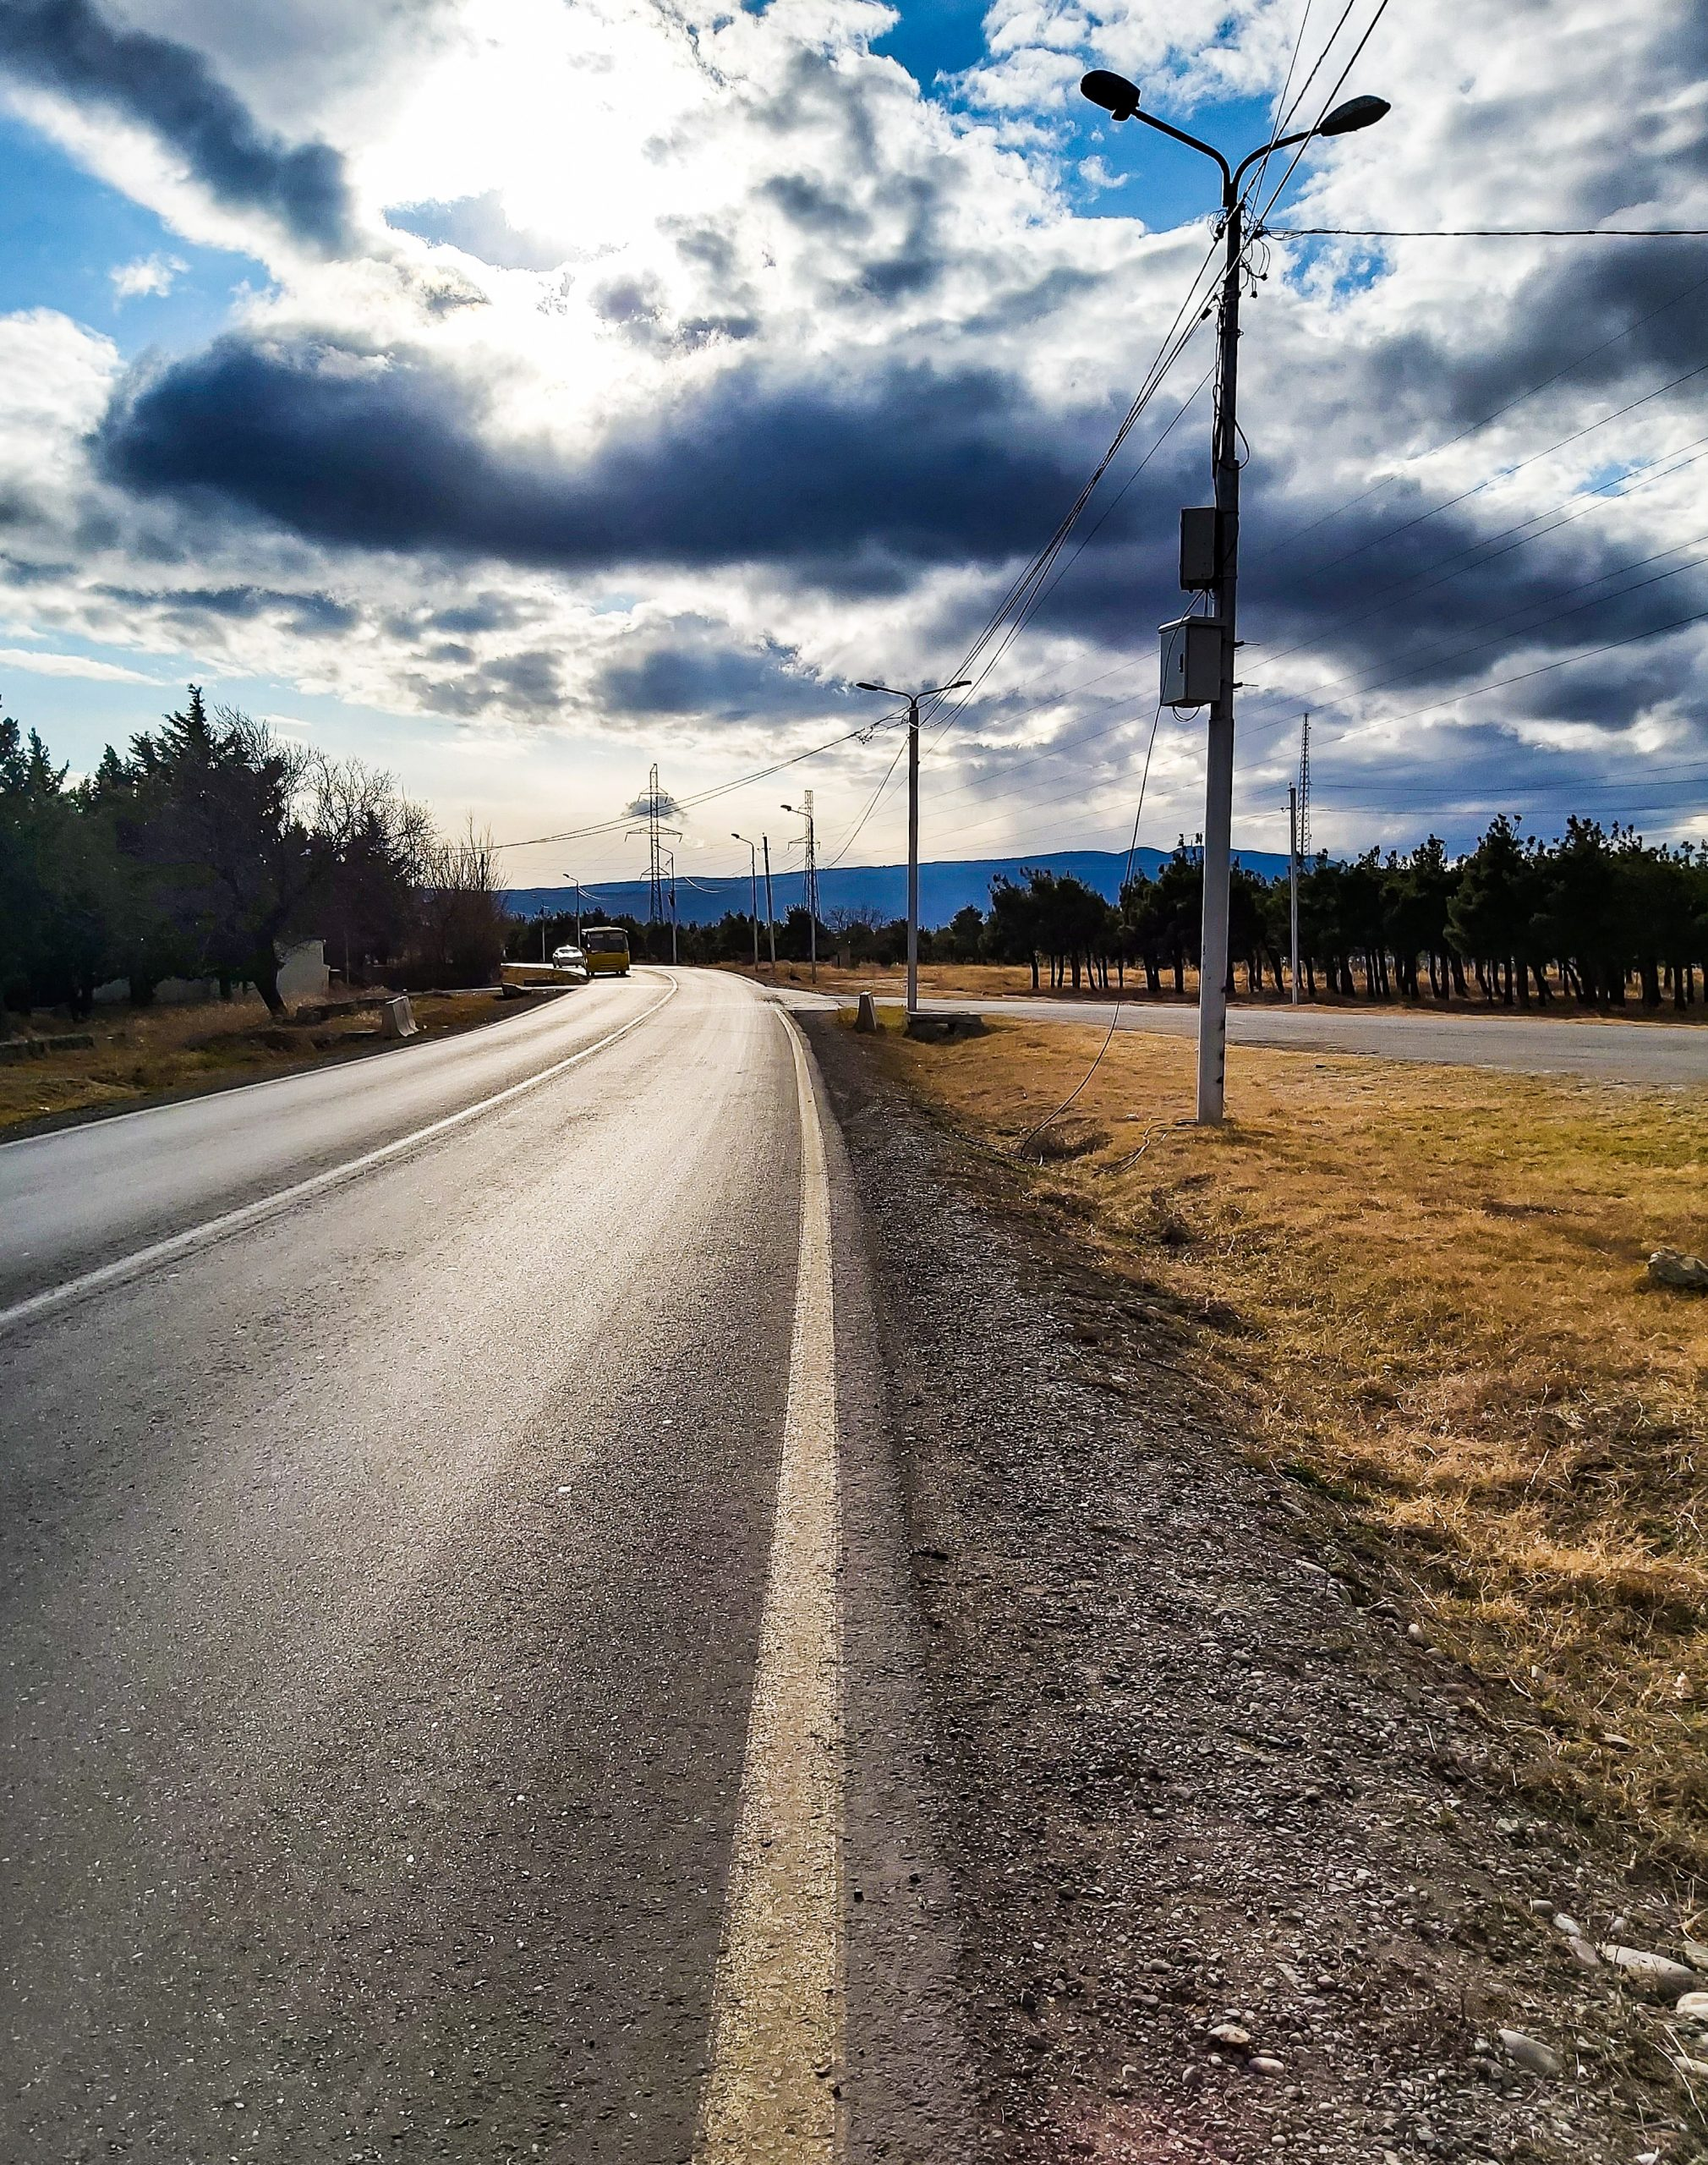 Beautiful road under clouds